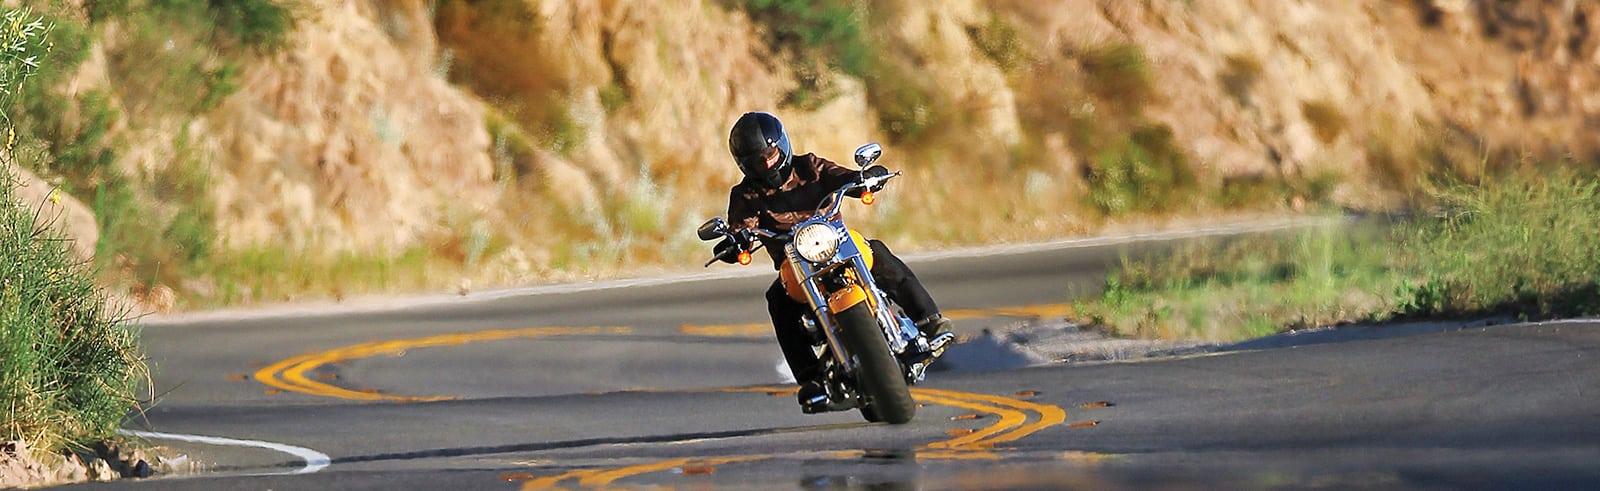 www.dunlopmotorcycletires.com